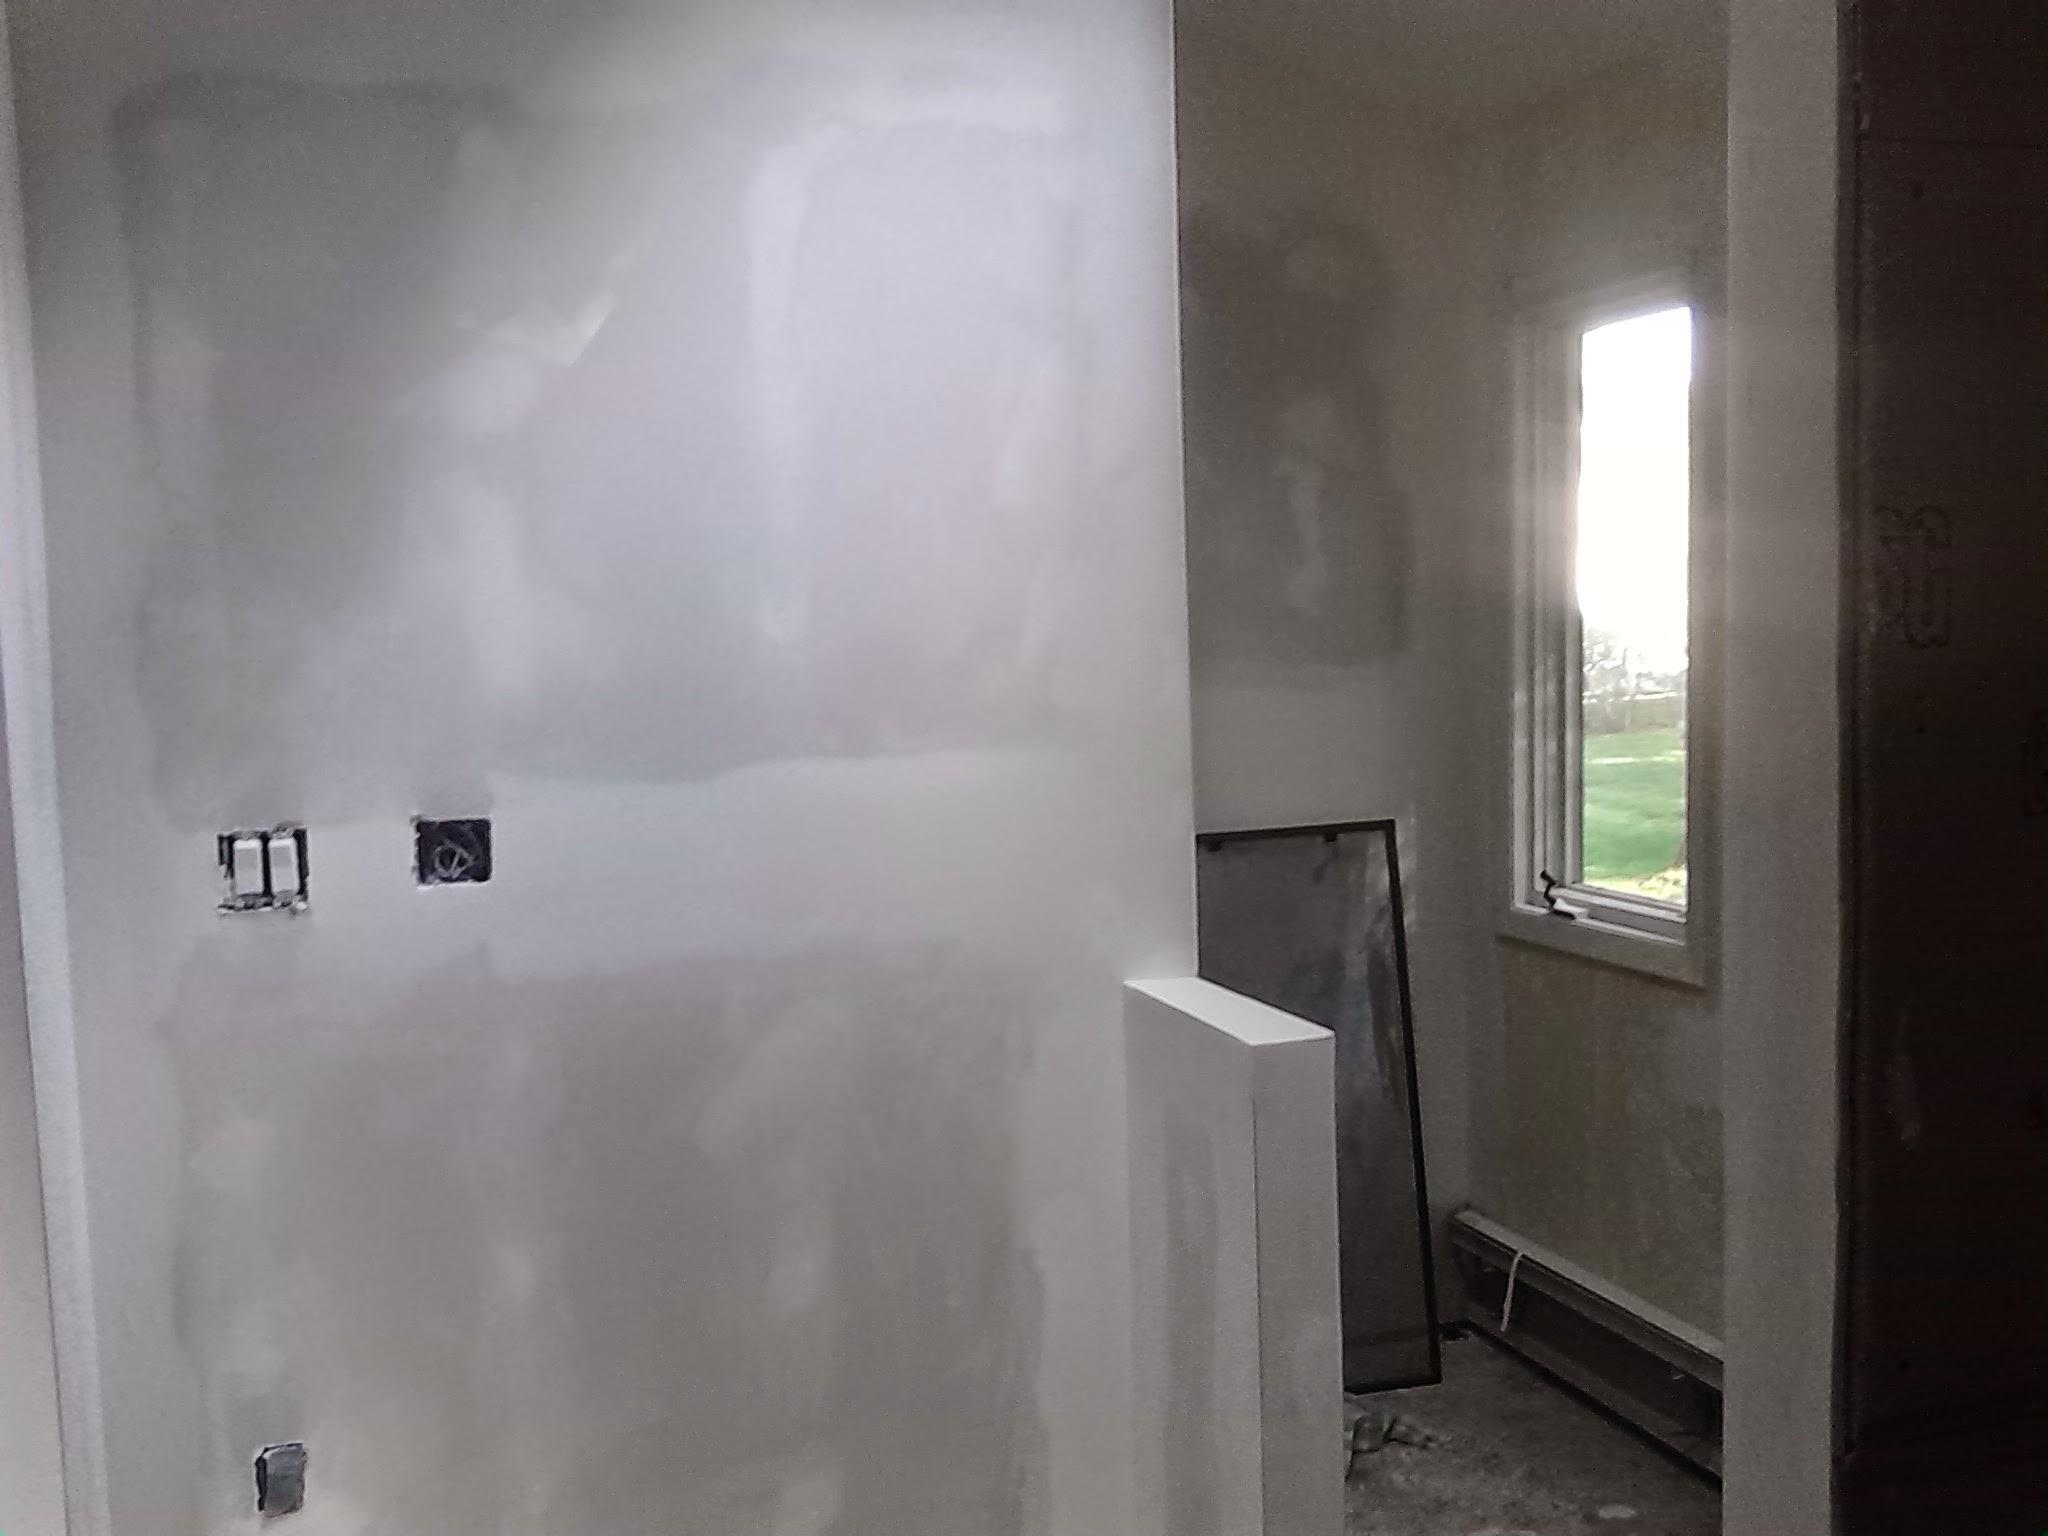 Nilsen Building and Remodeling, Llc